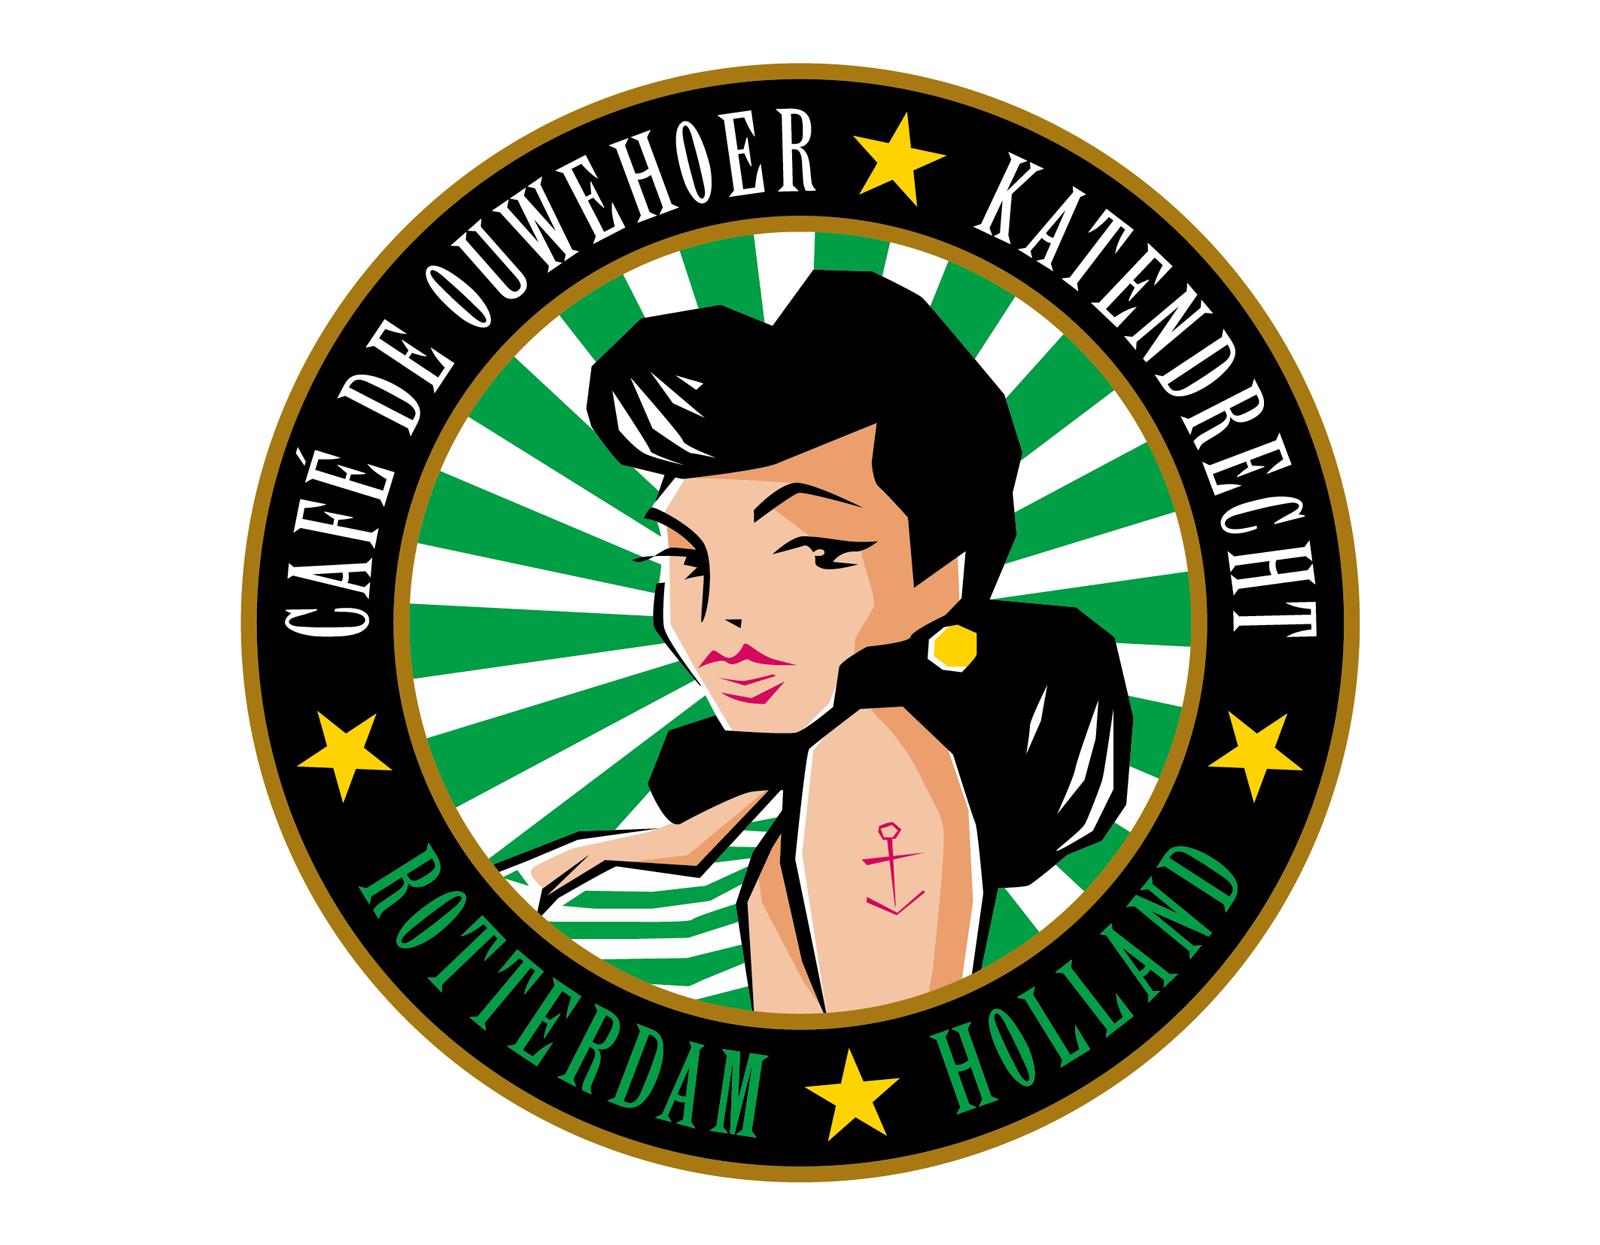 De_Ouwehoer_badge_Holland_fc_def